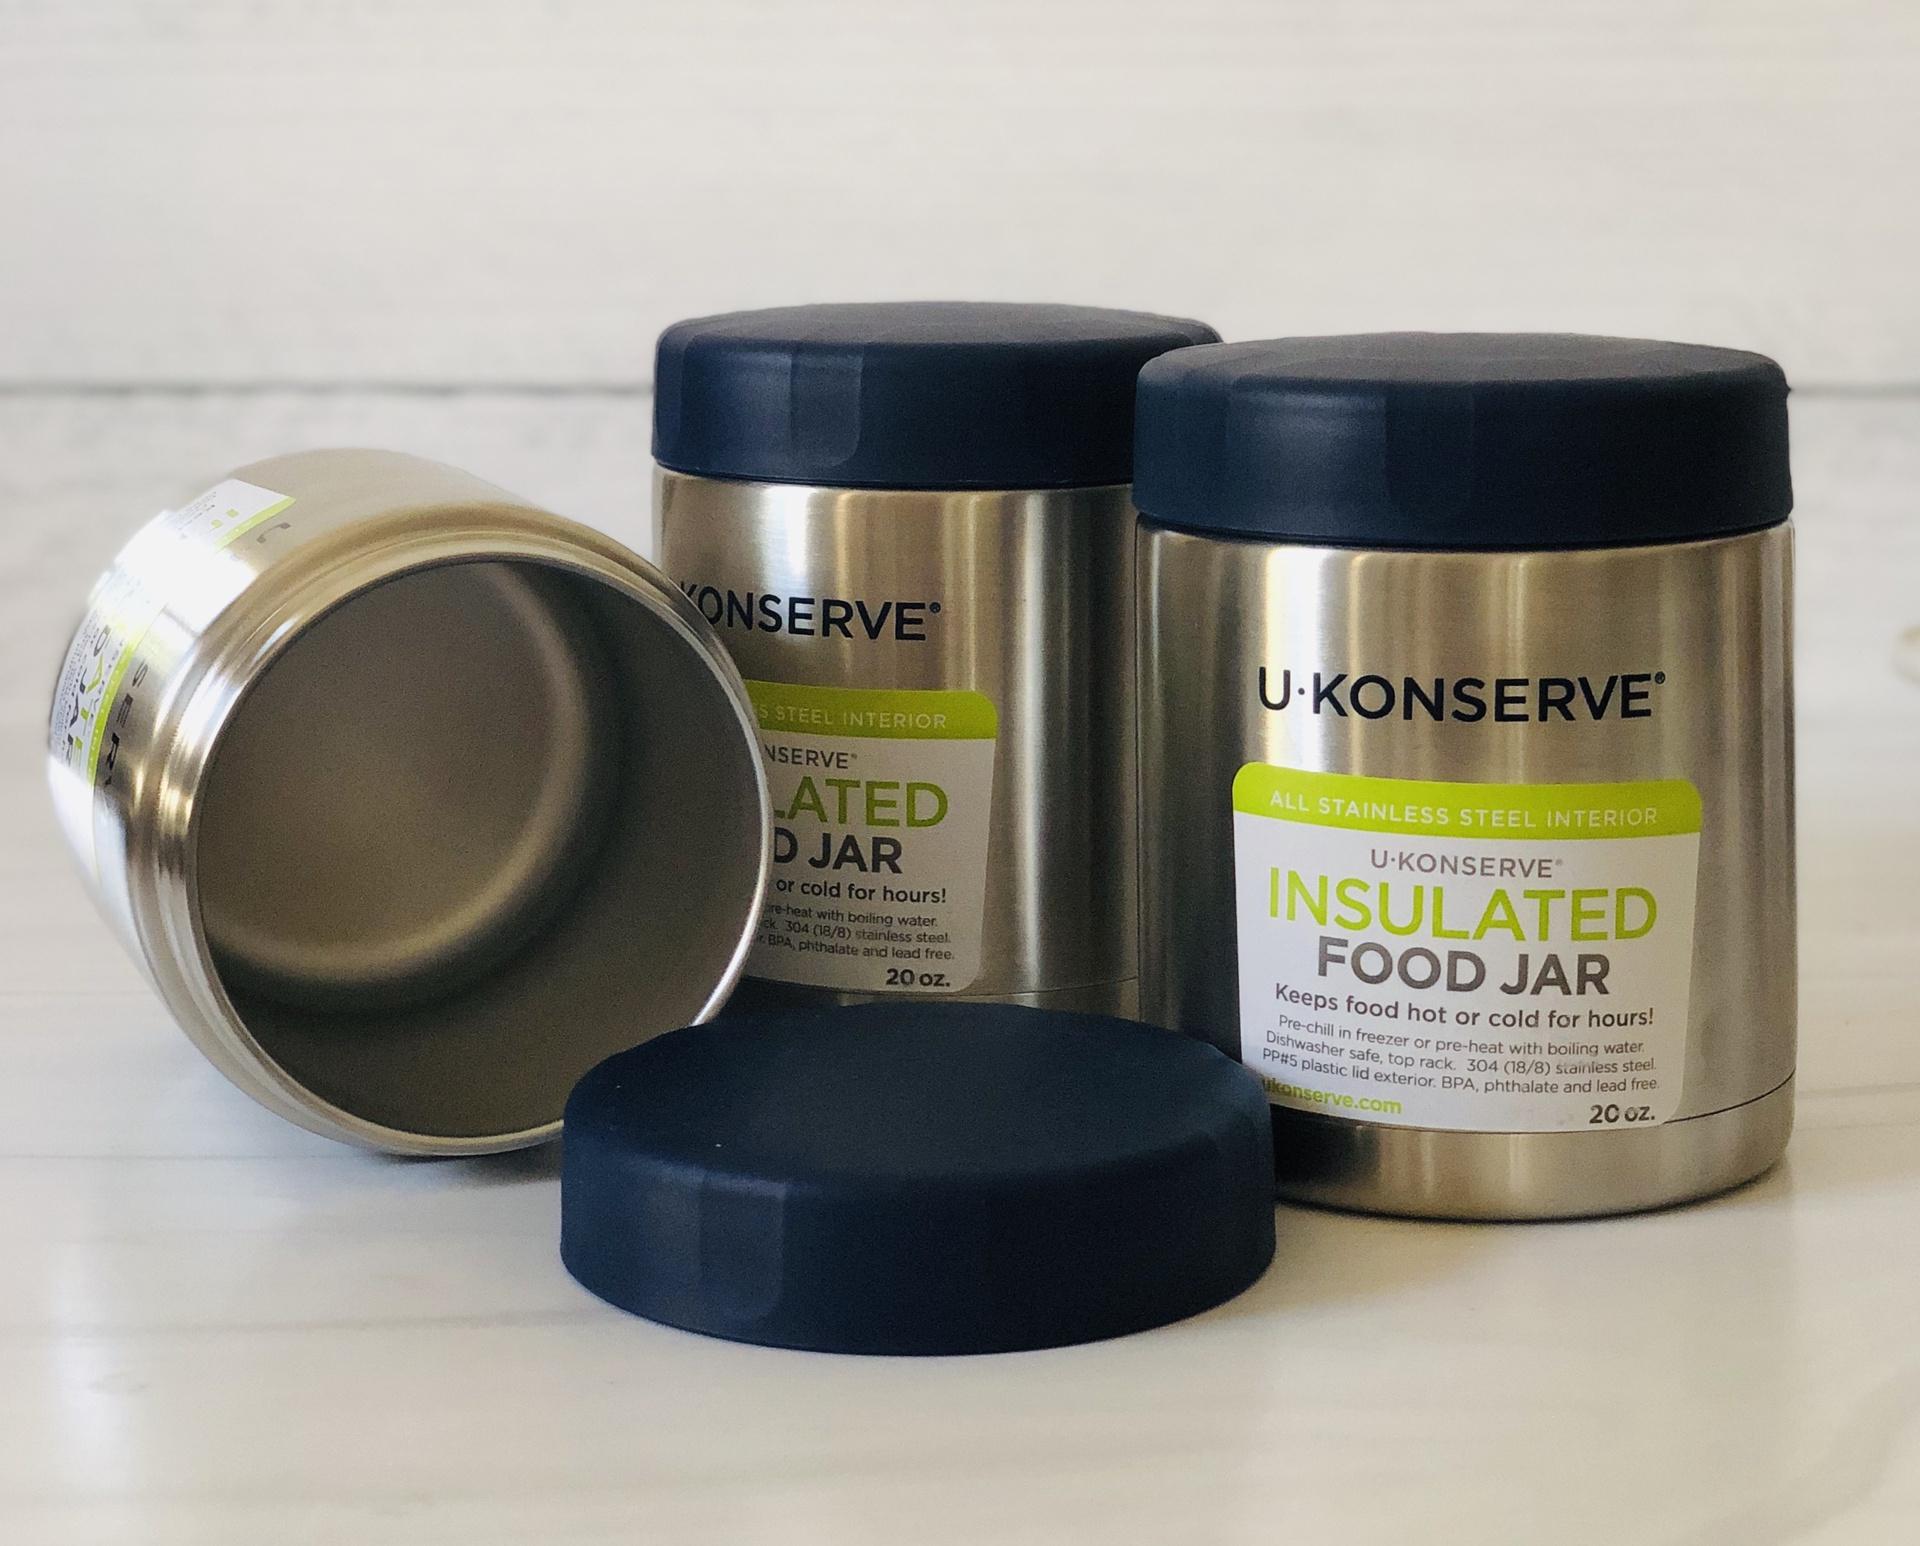 UKonserve Insulated Food Jar, 20oz